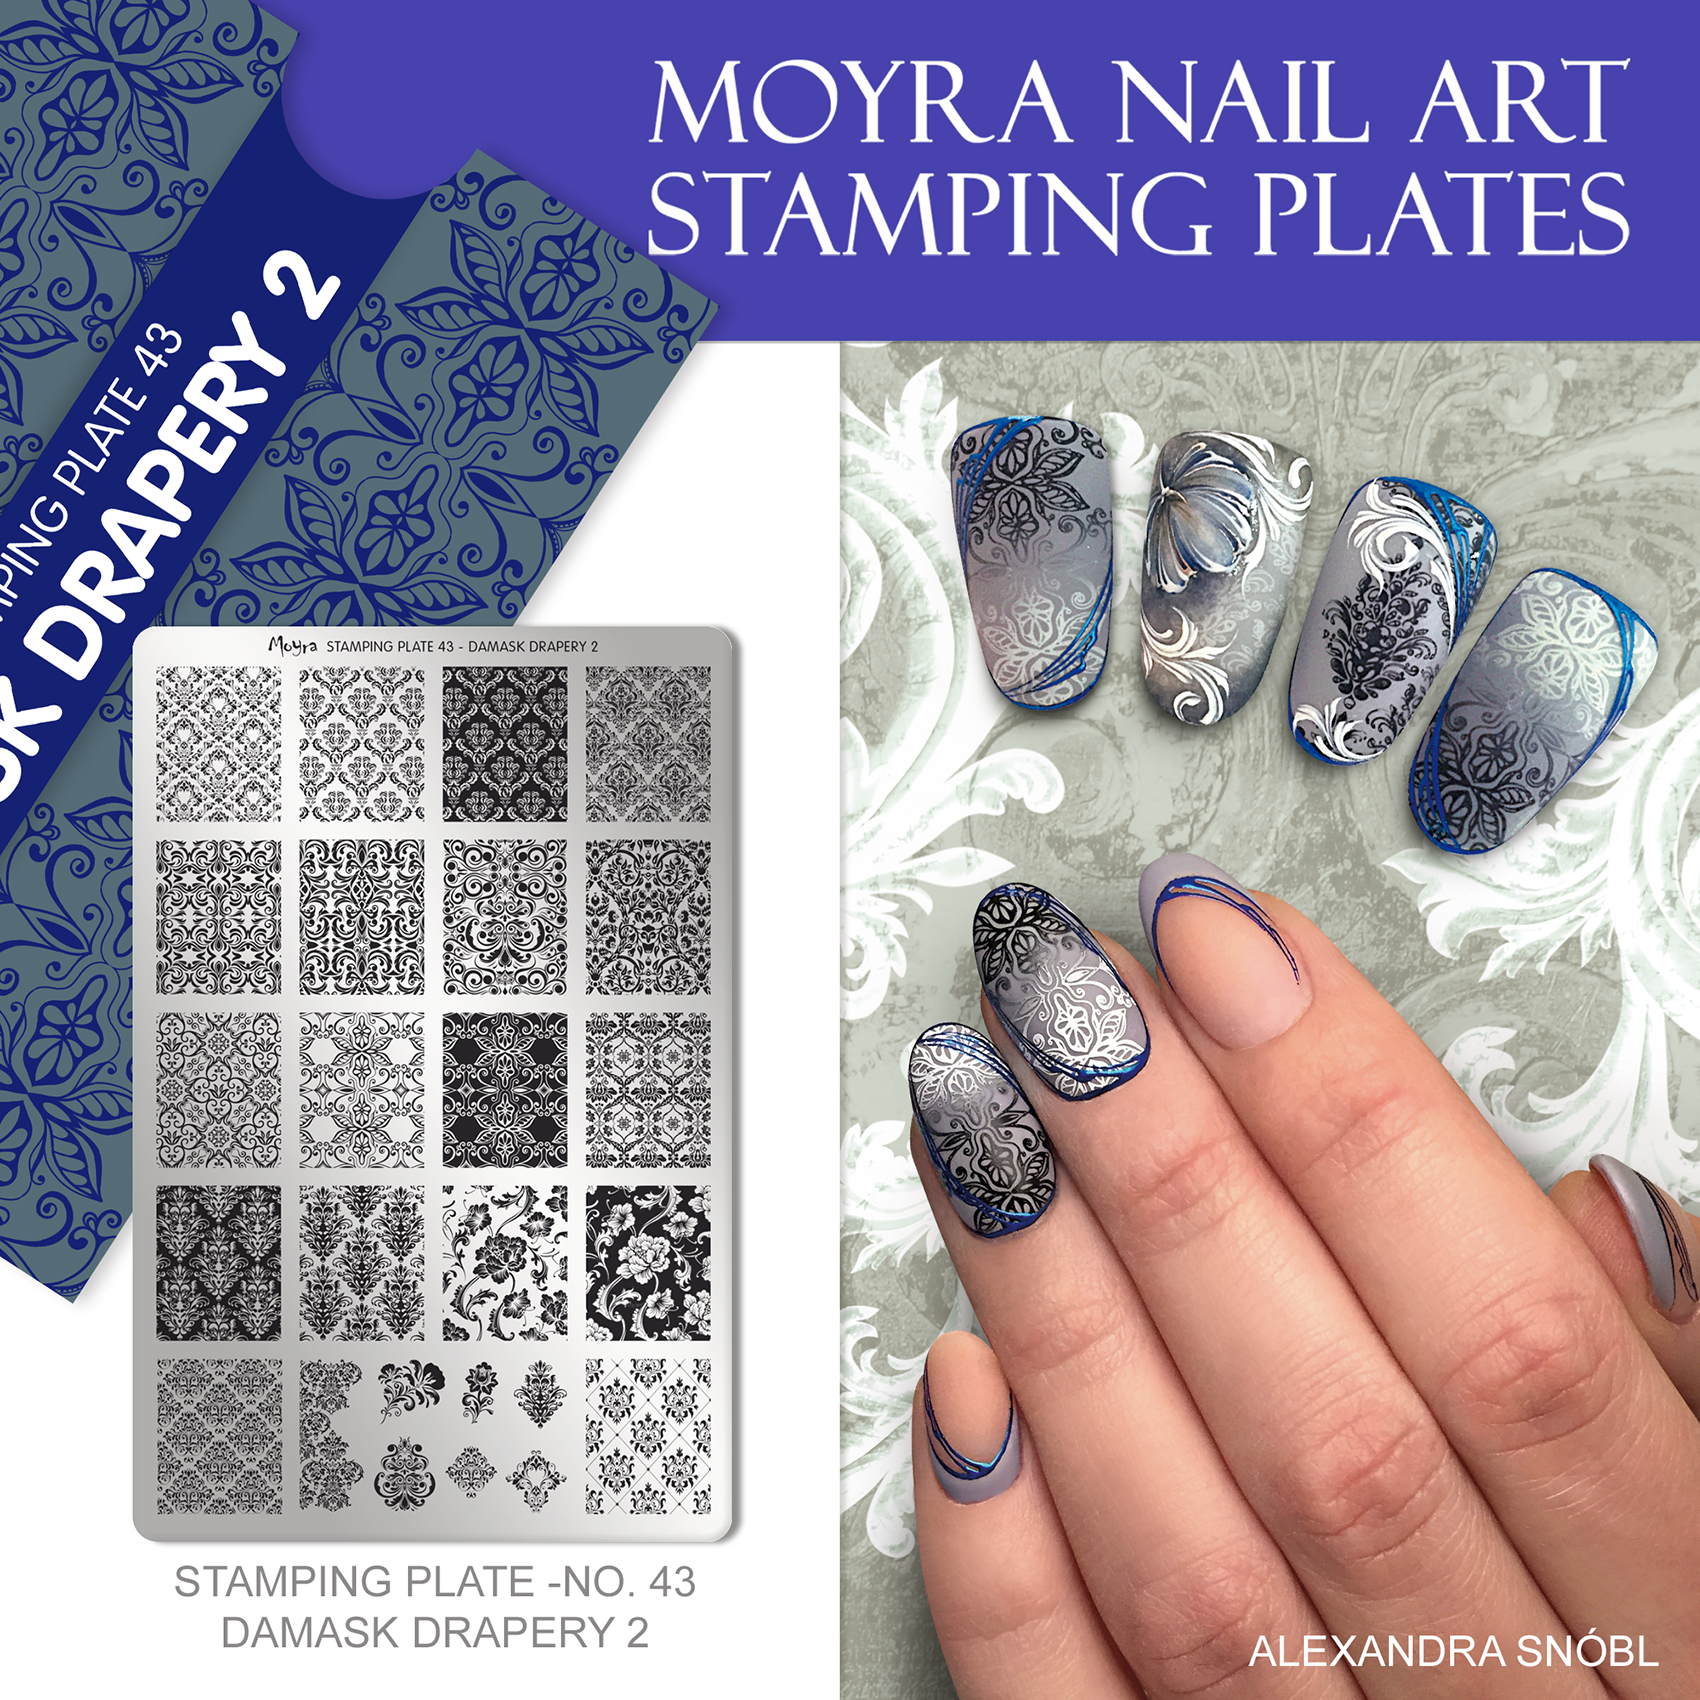 Moyra Nail Art Stamping Plate No. 43 Damask Drapery 2